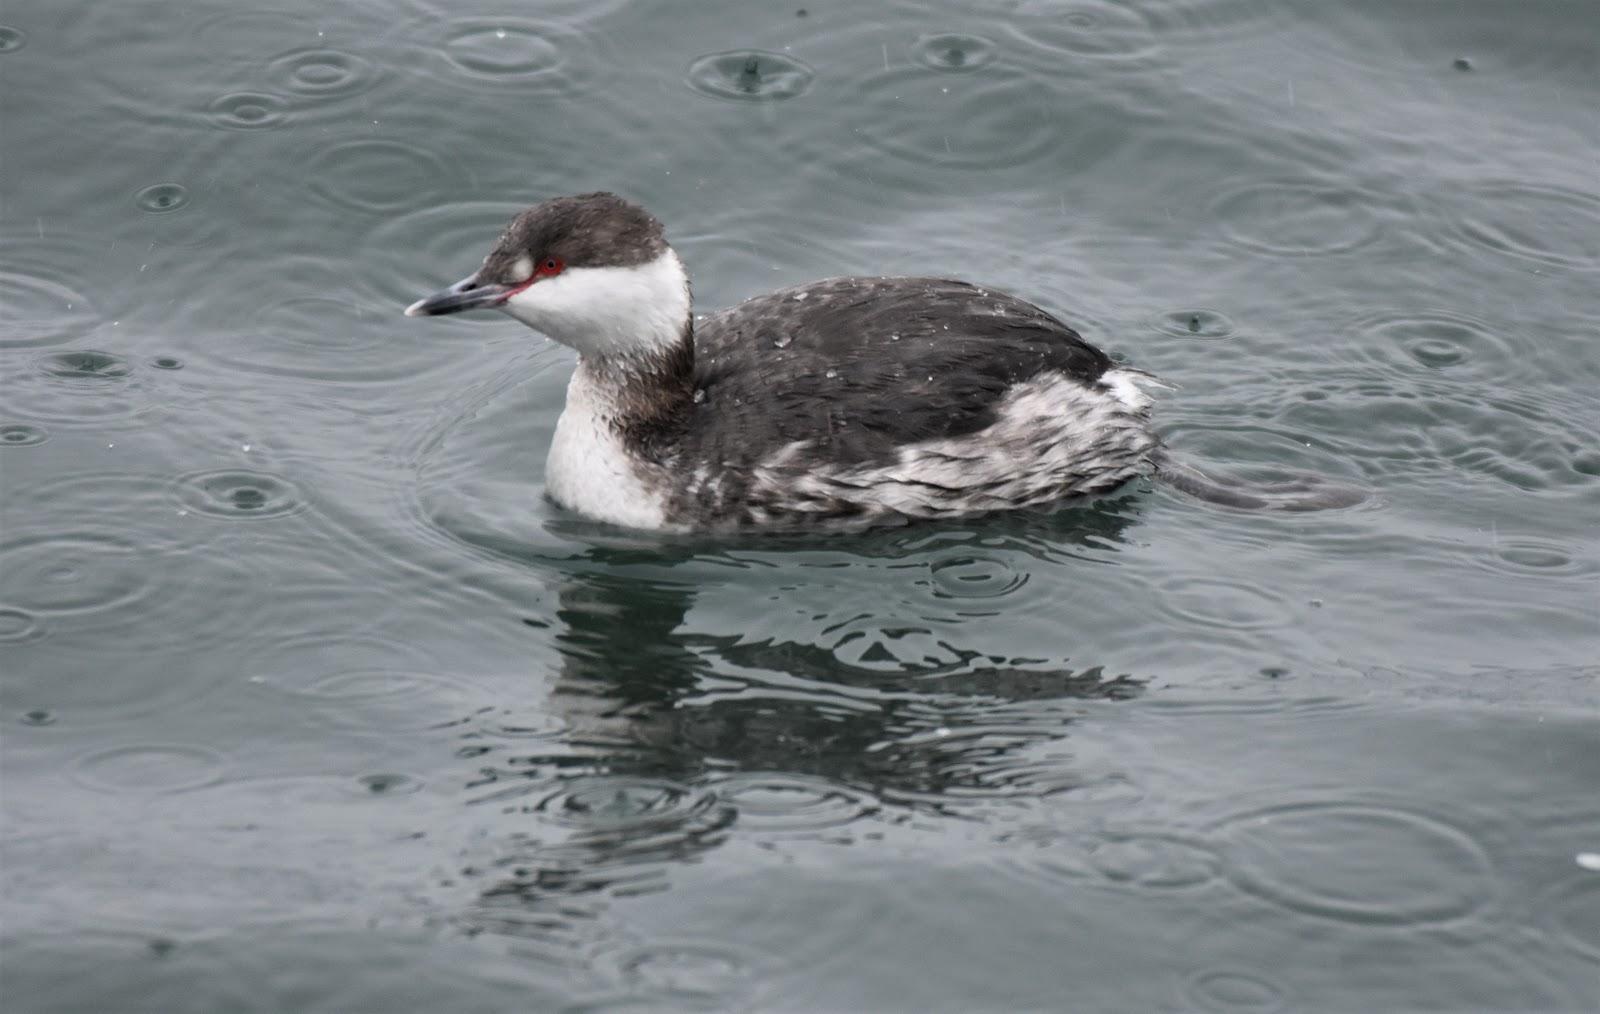 Bird Identificationwhat looks like a black loon